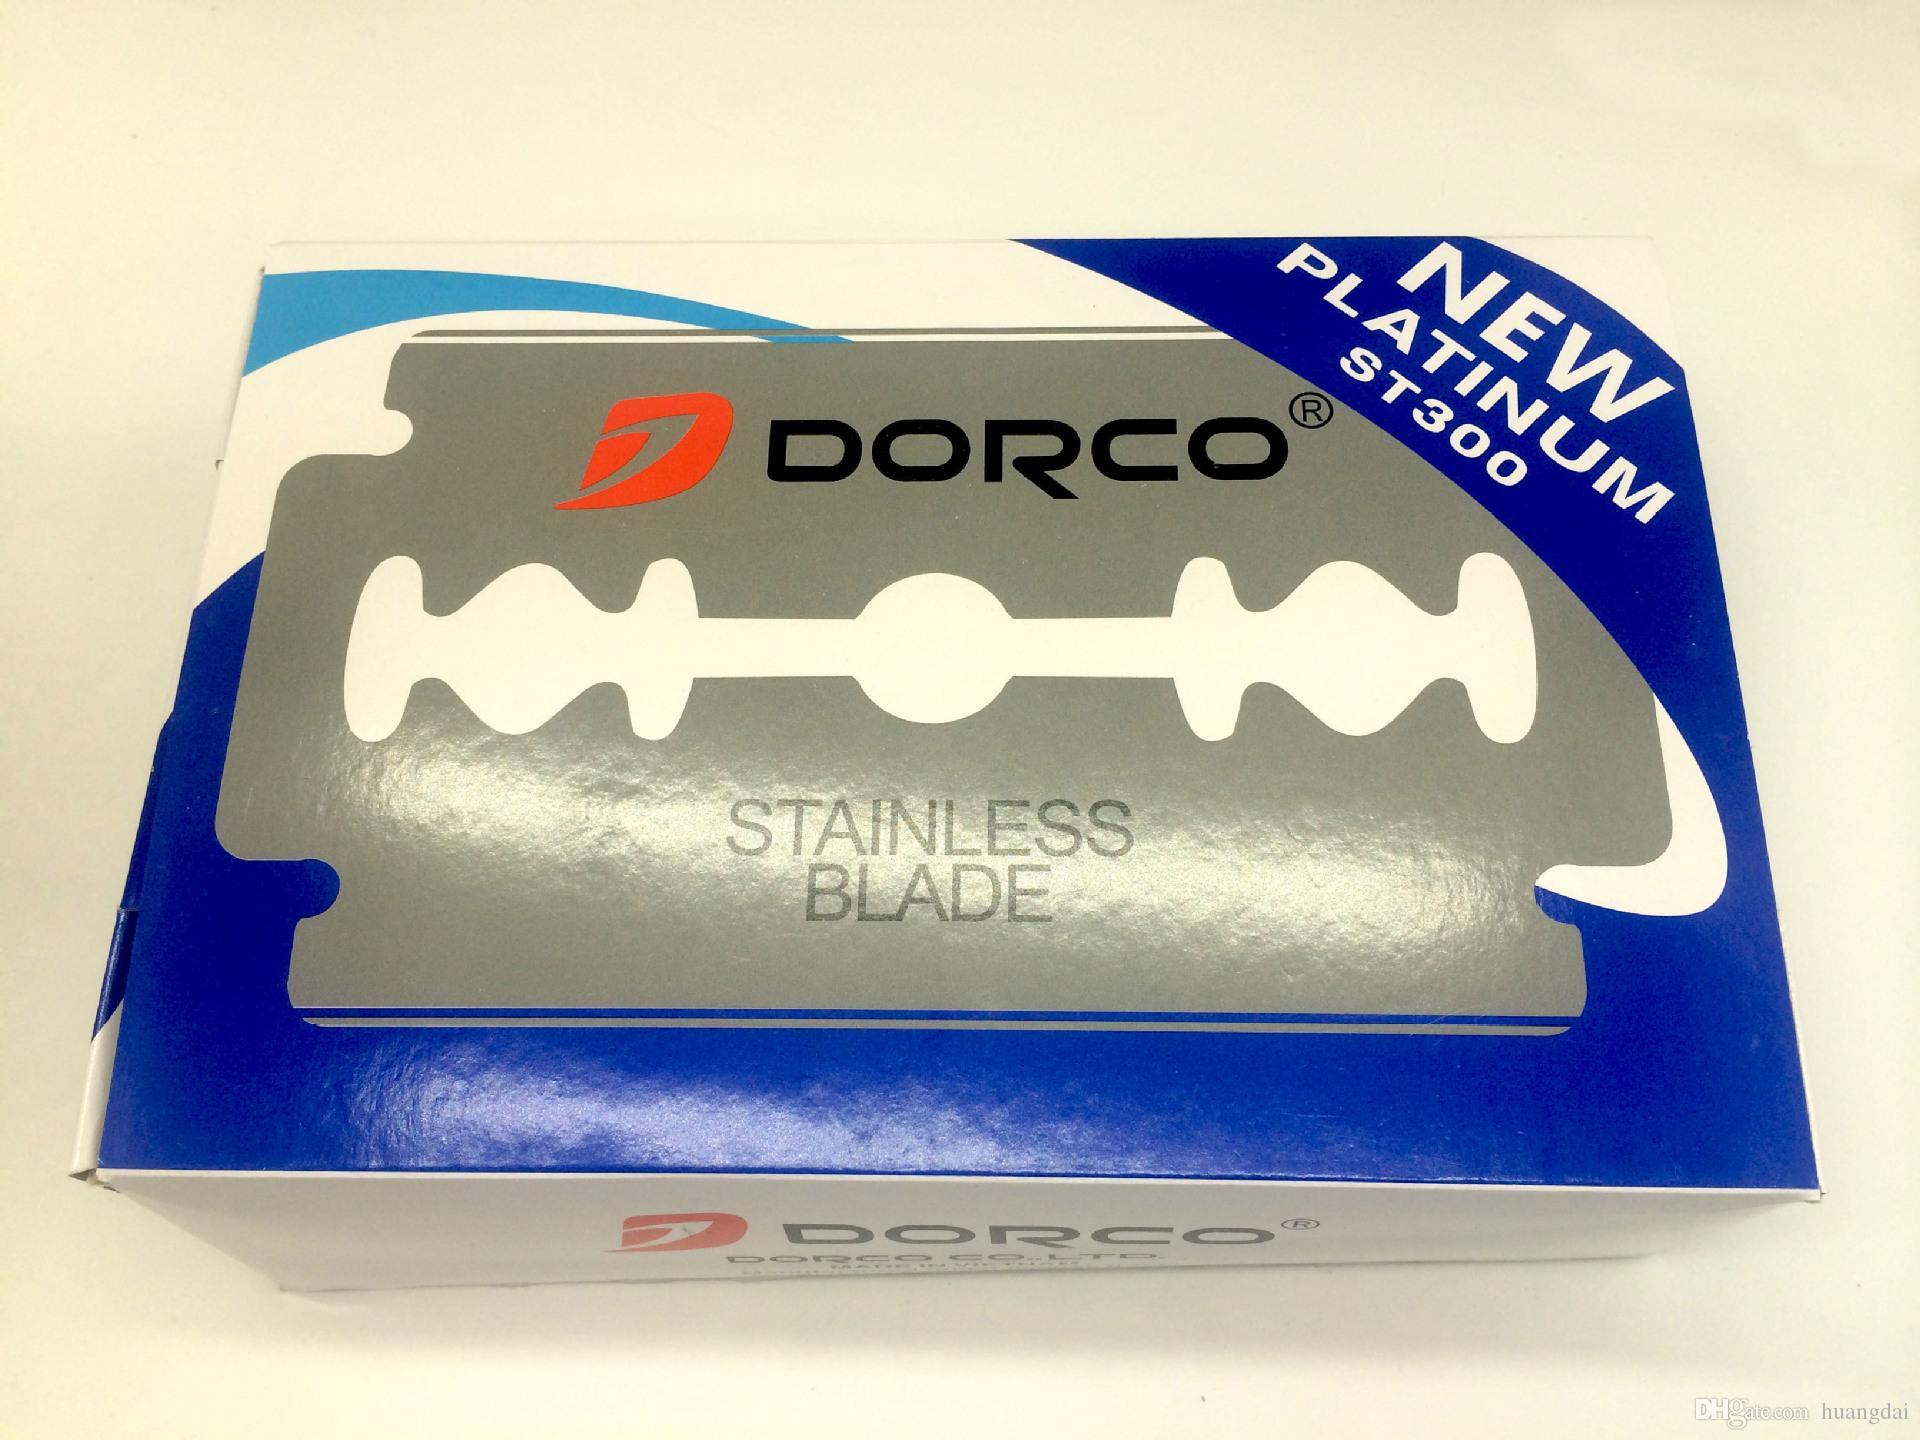 High Quality Dorco Blades Platnum Stainless Steel Double Edge Blade Safety Razor Blade Hot Sale